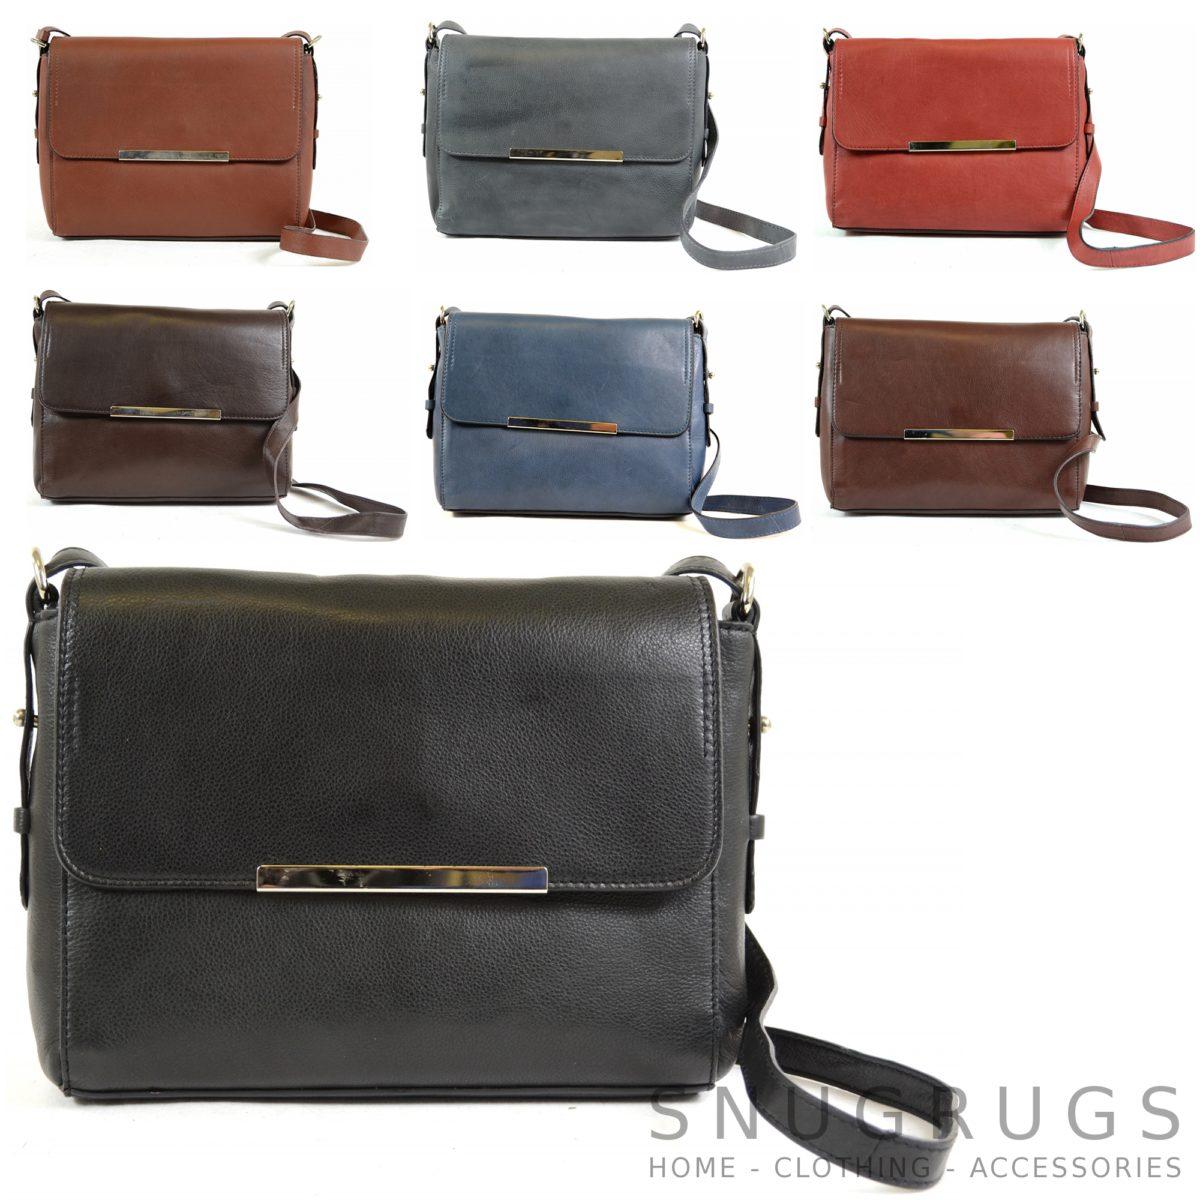 Nicole – Soft Leather Shoulder / Cross Body Bag